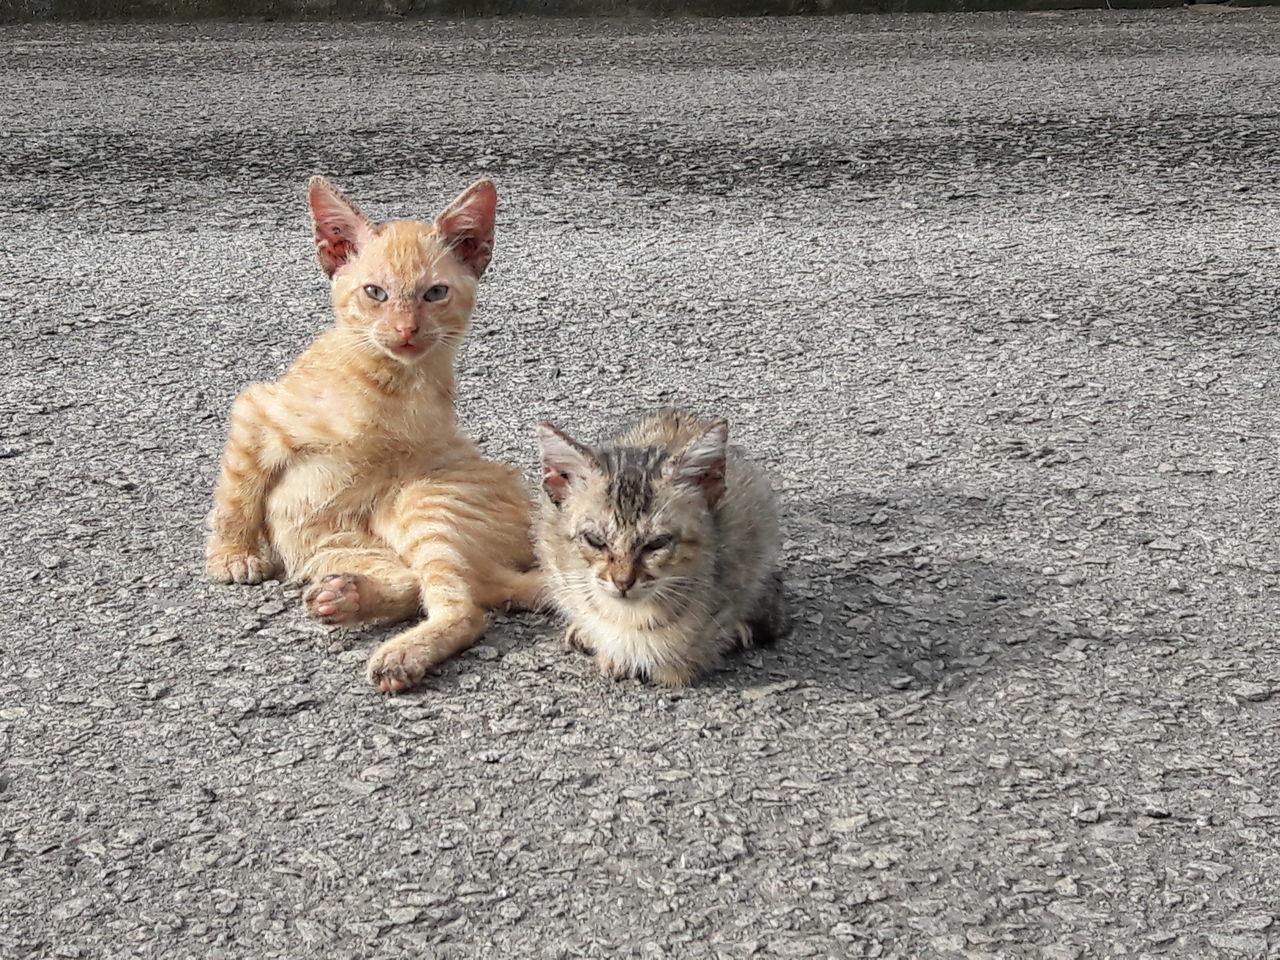 Beautiful stock photos of baby katzen, pets, domestic animals, animal themes, mammal